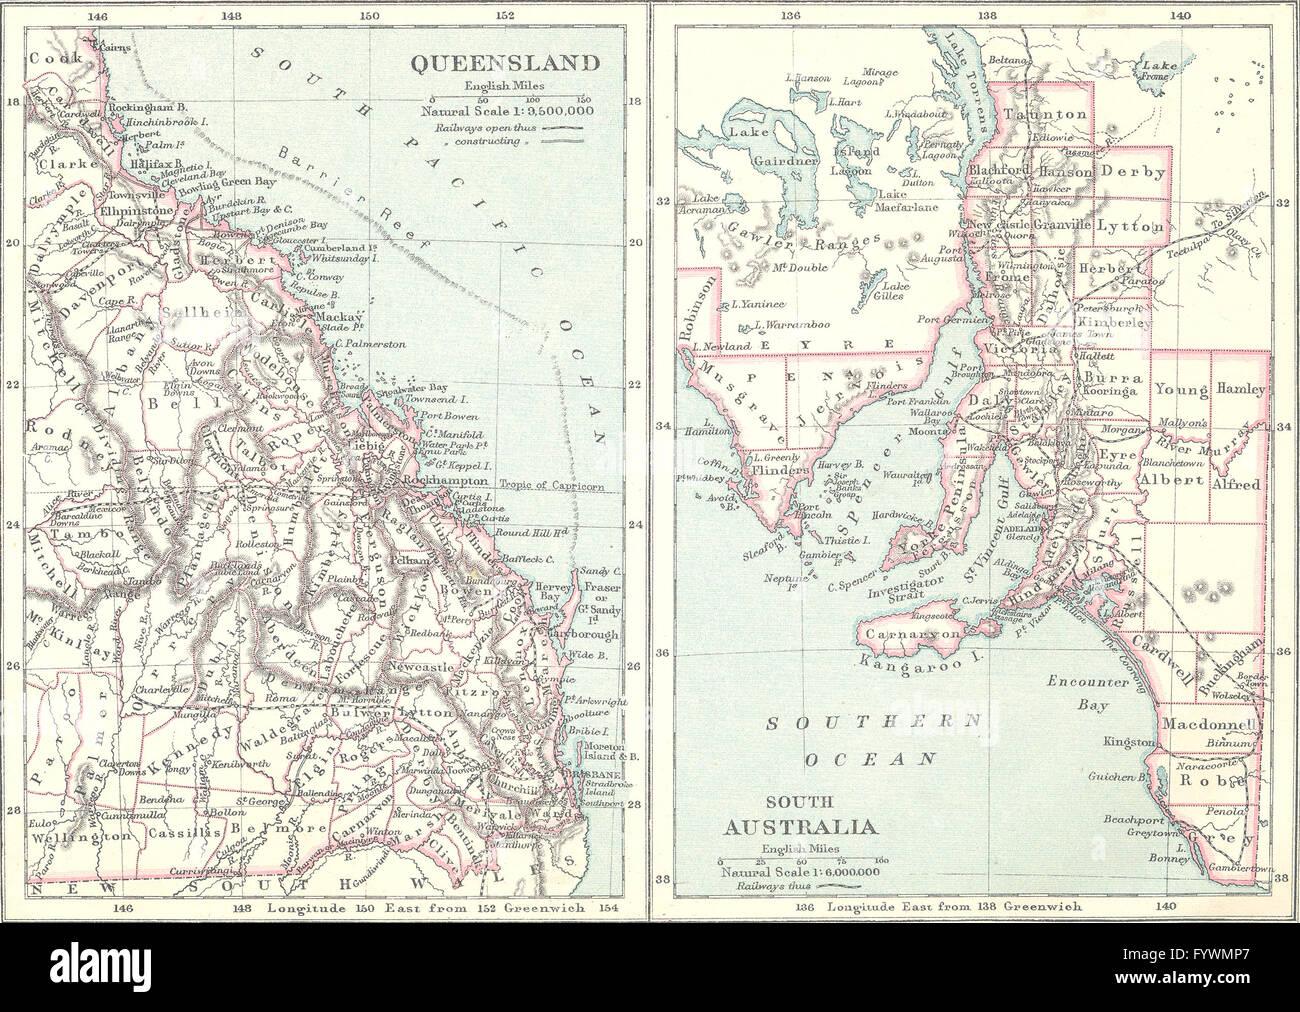 AUSTRALIA: Queensland; South, 1890 antique map - Stock Image